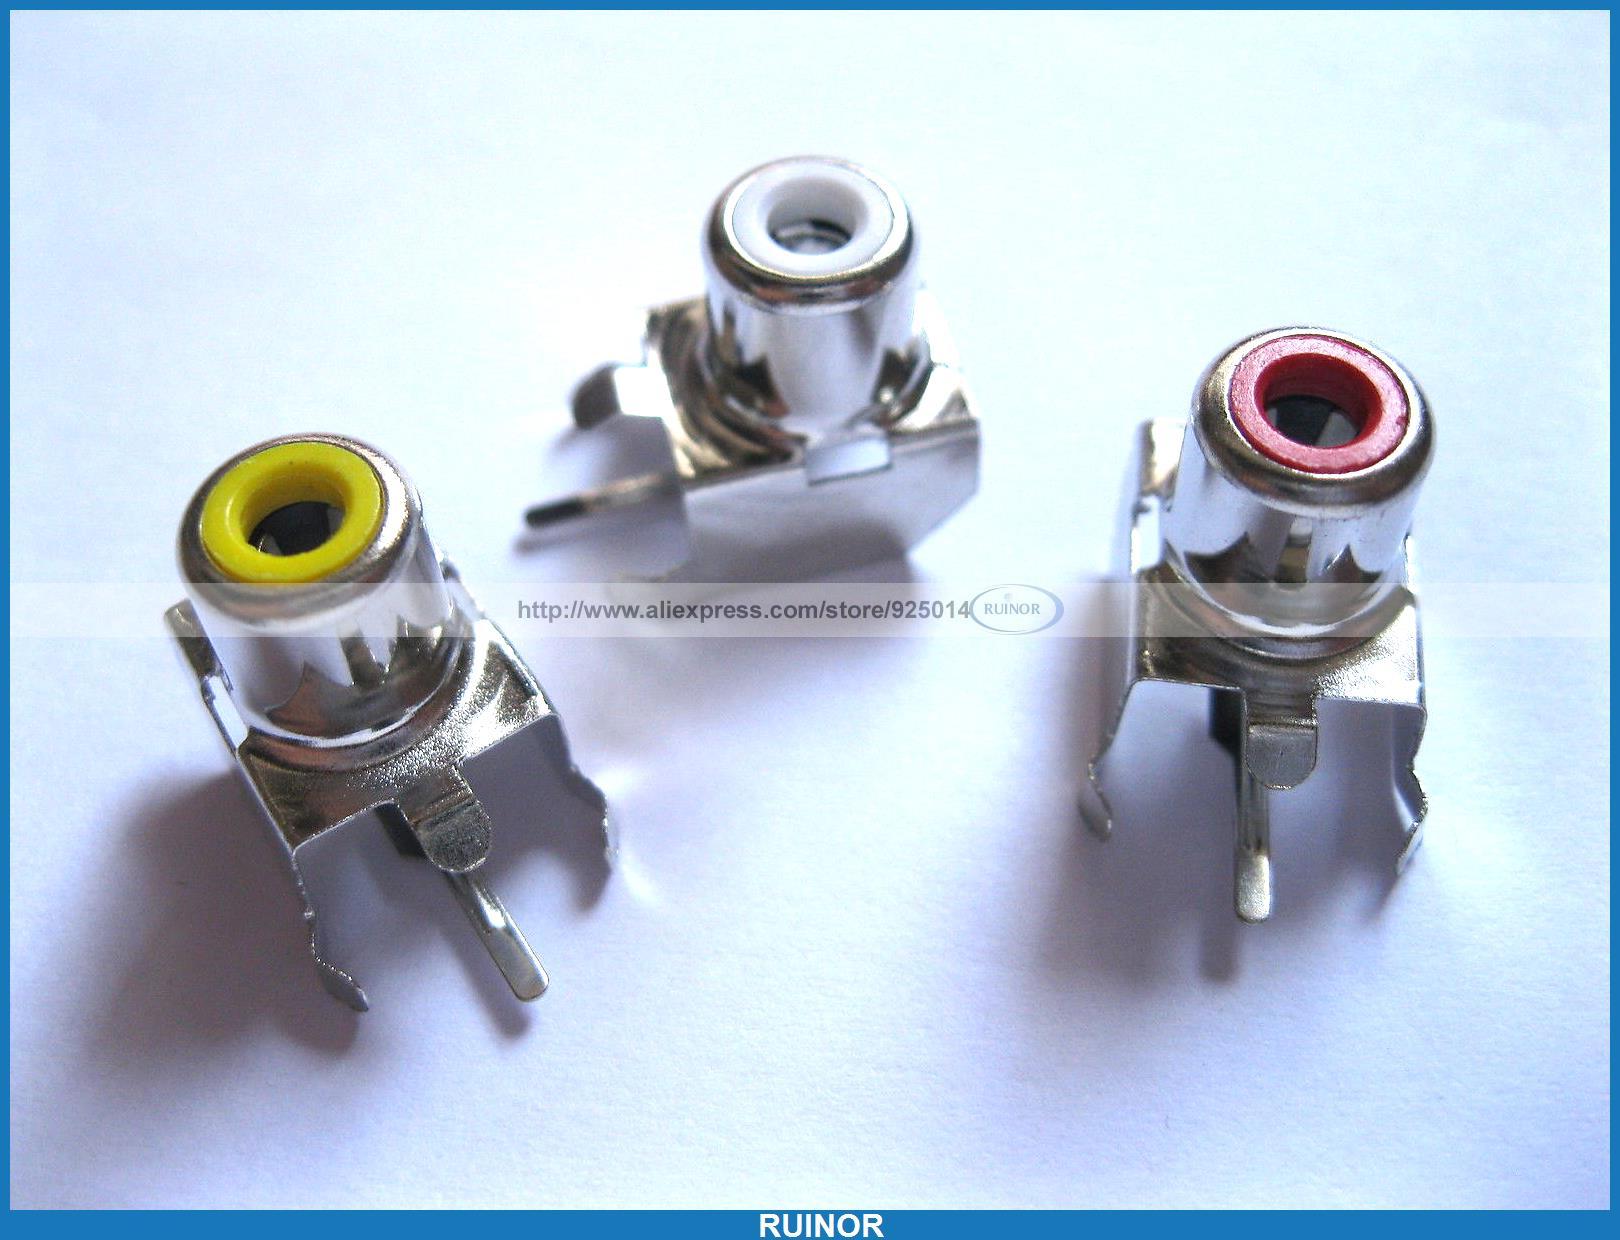 60 Pcs AV 8 4 3 AV Pin Jack 3 Color RCA Female Audio Video AV Socket Connector<br><br>Aliexpress